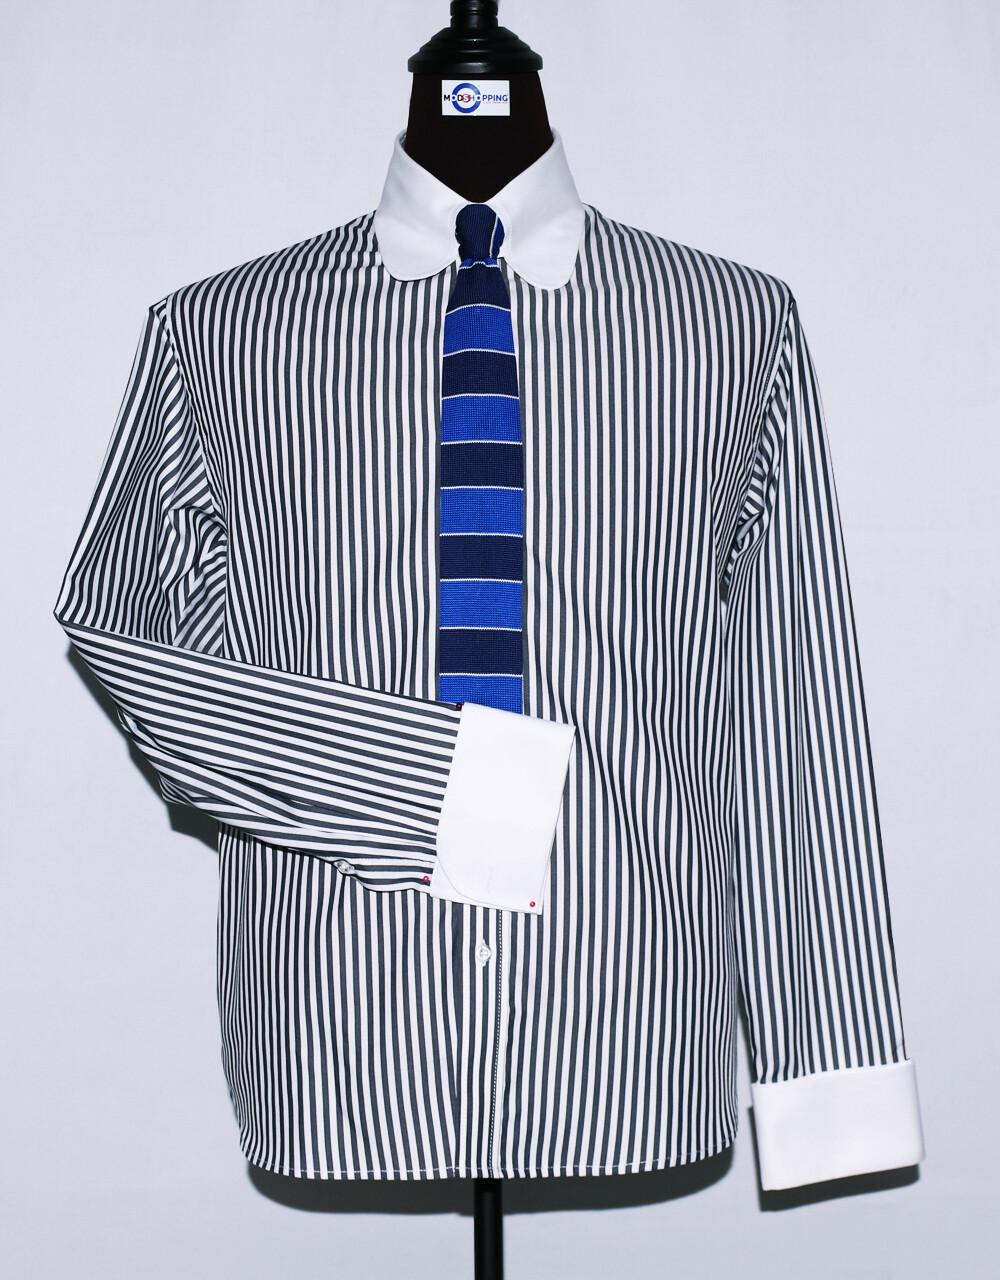 Tab Collar | Black Striped Dress Men's Shirt